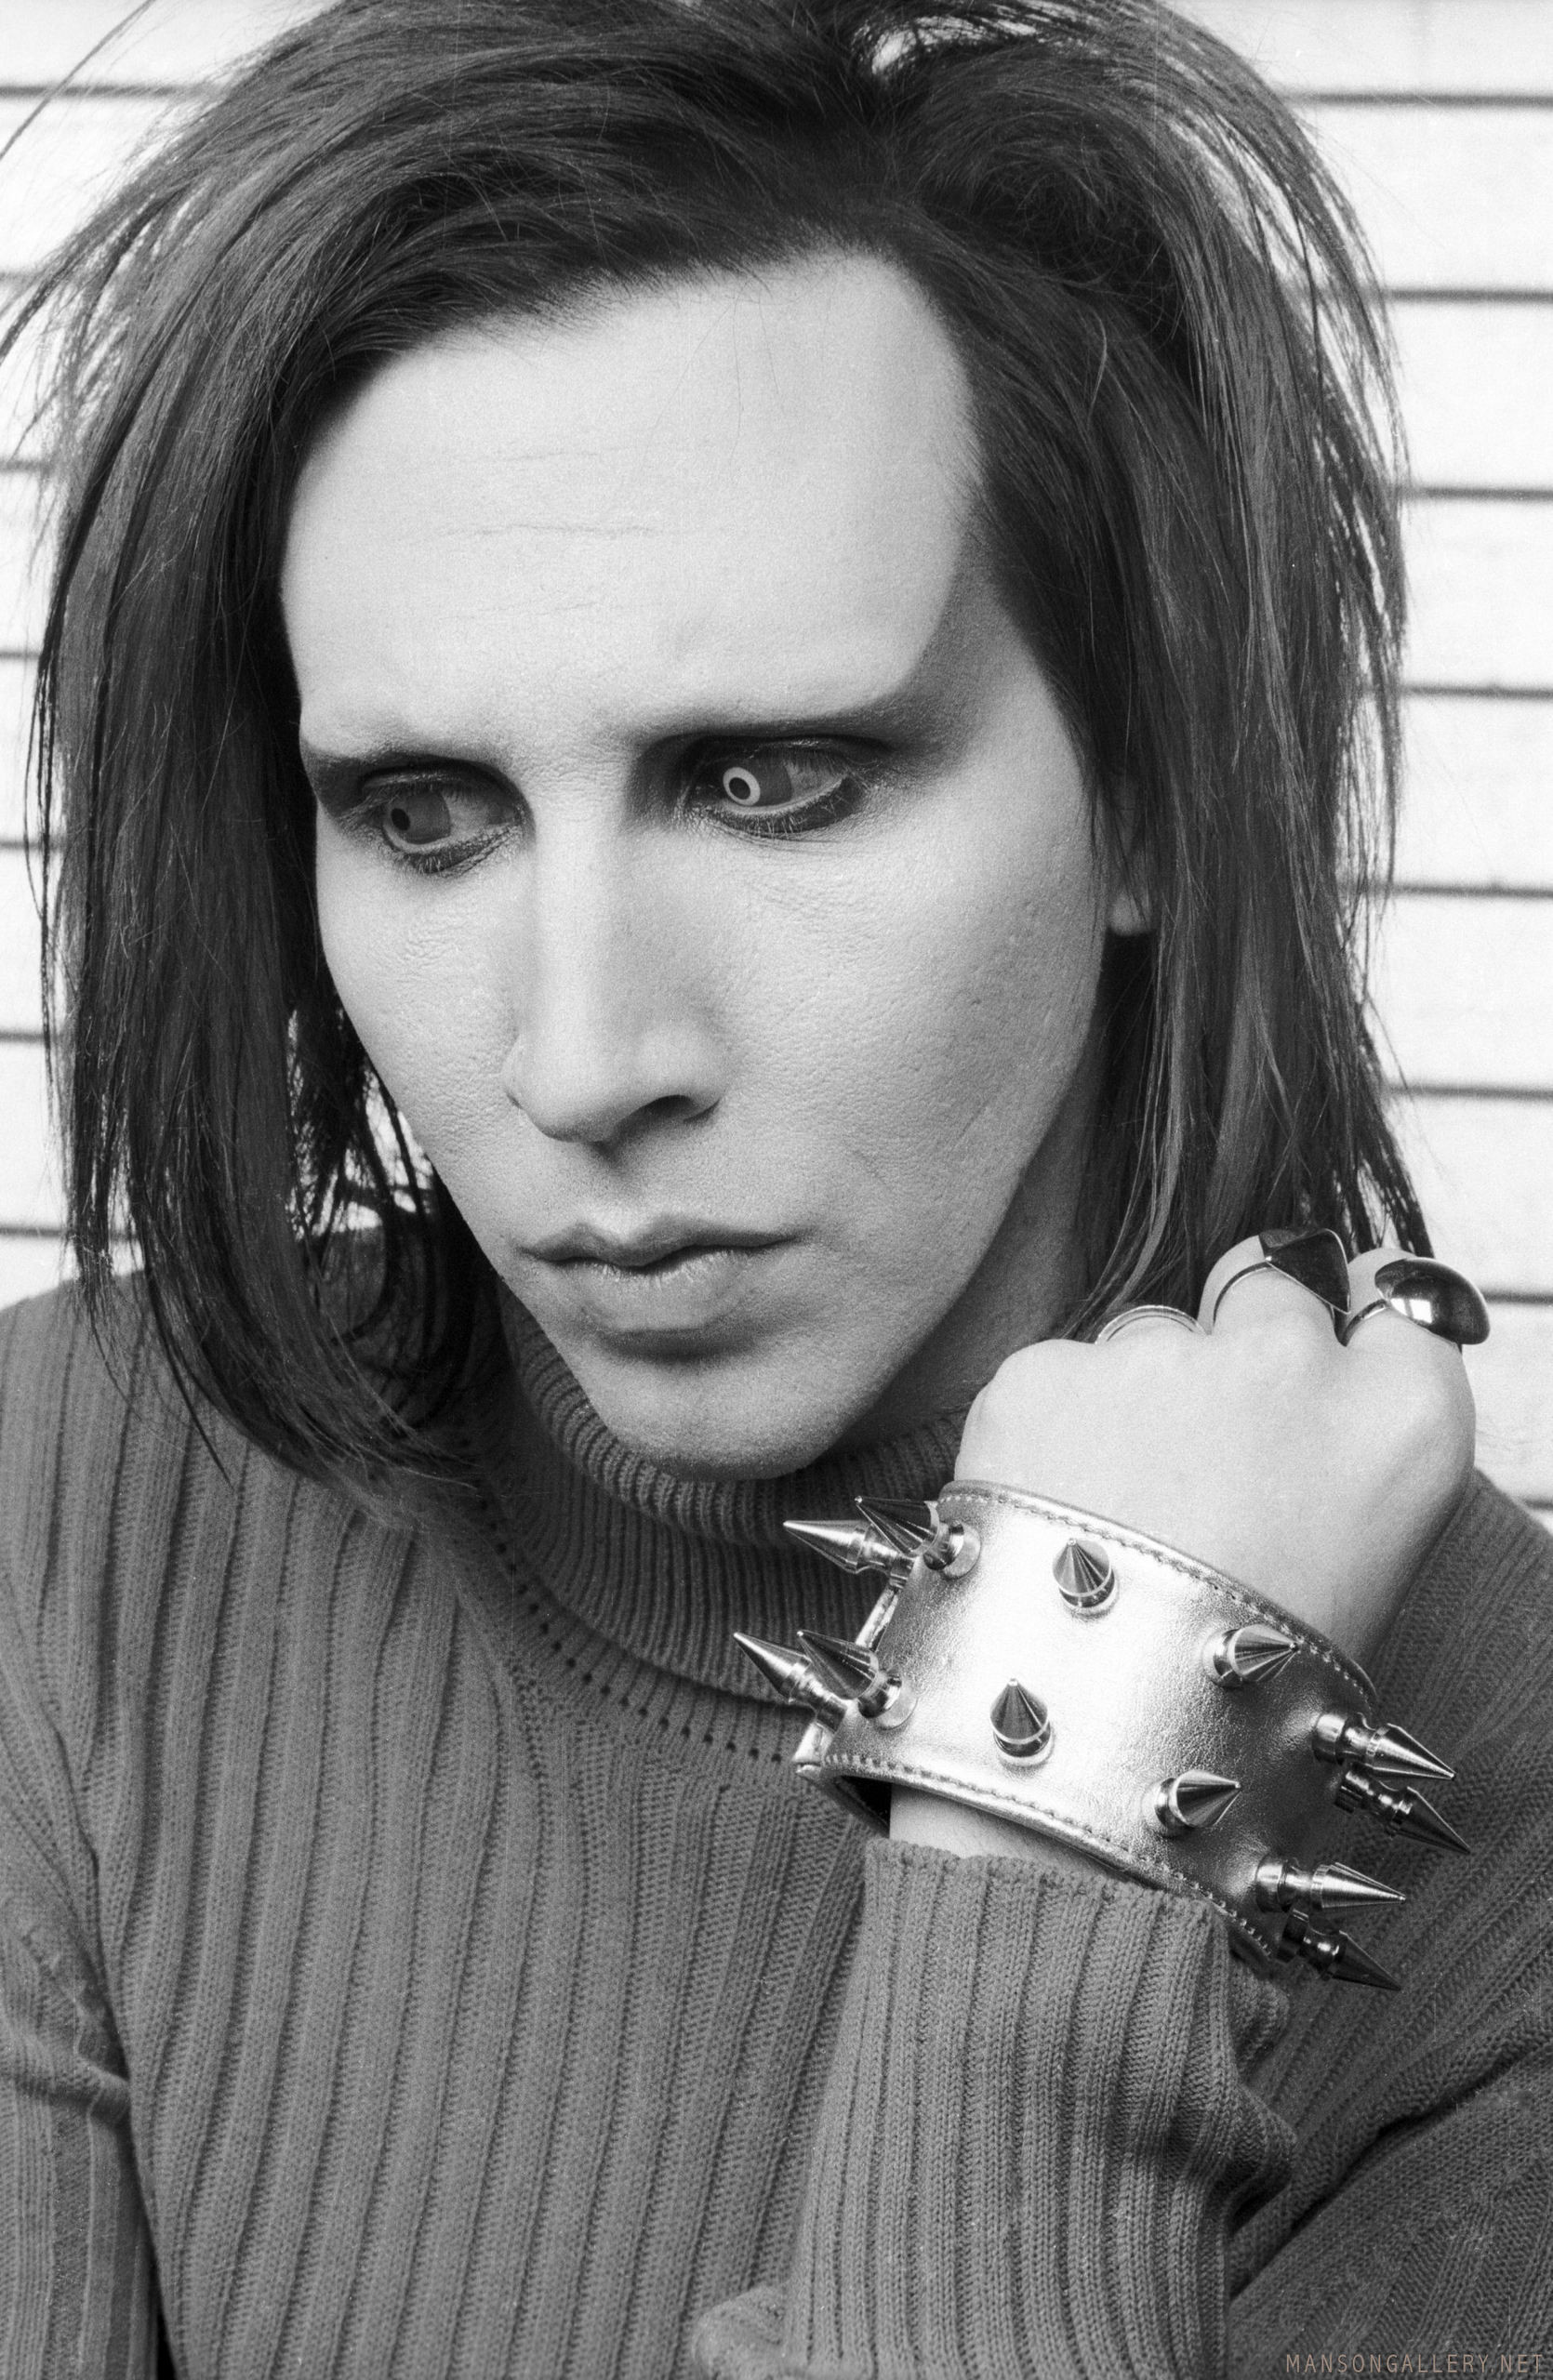 Marilyn Manson. Photography ID: 37115